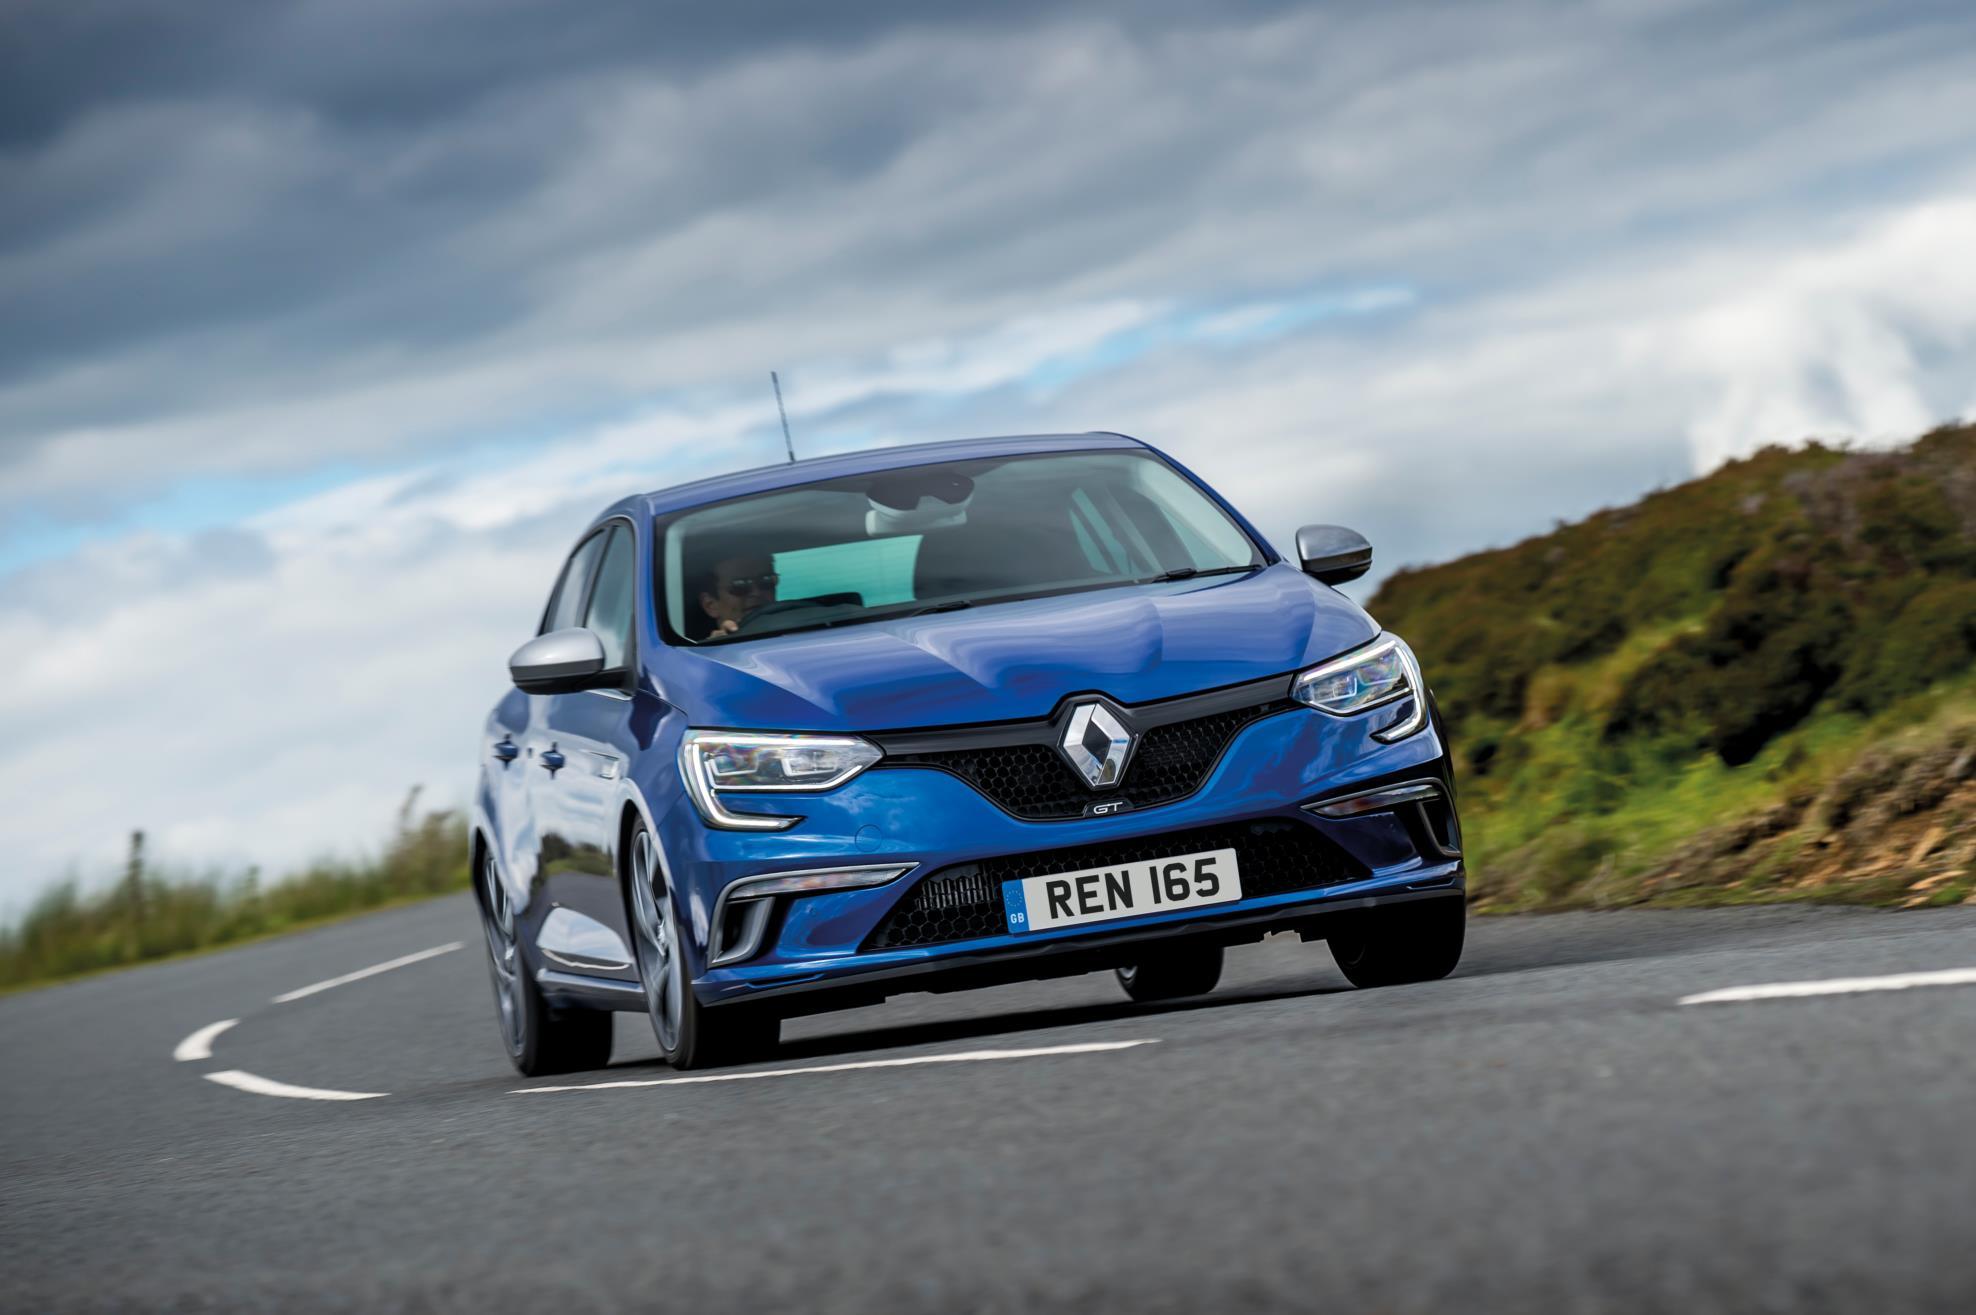 Renault UK Adds Flagship Diesel Engine To Megane Range - autoevolution